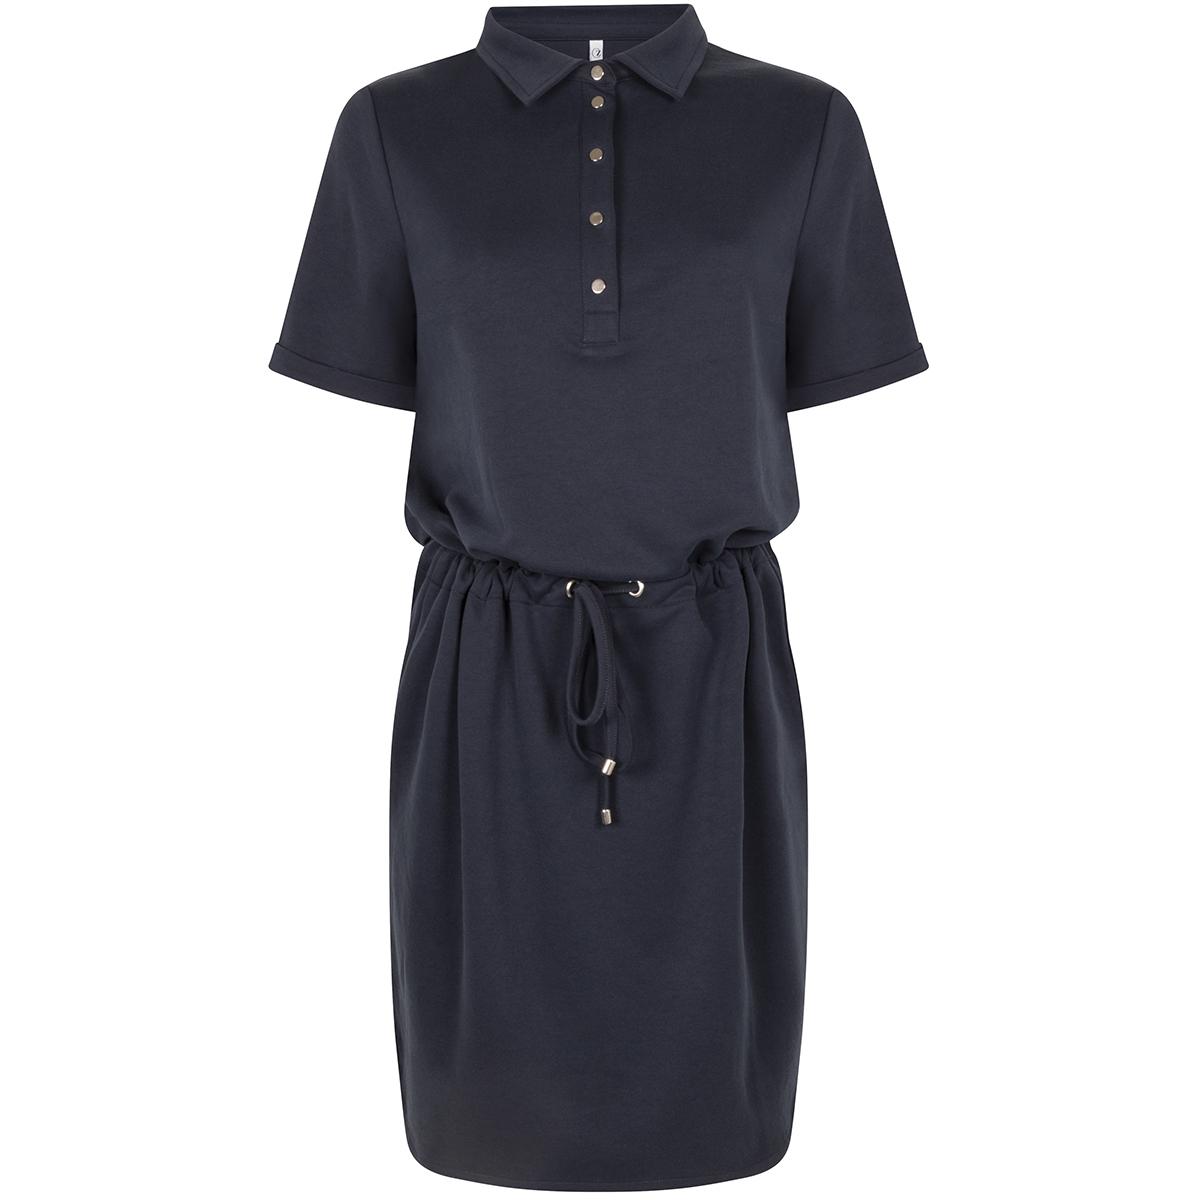 solar polo dress 202 zoso jurk navy